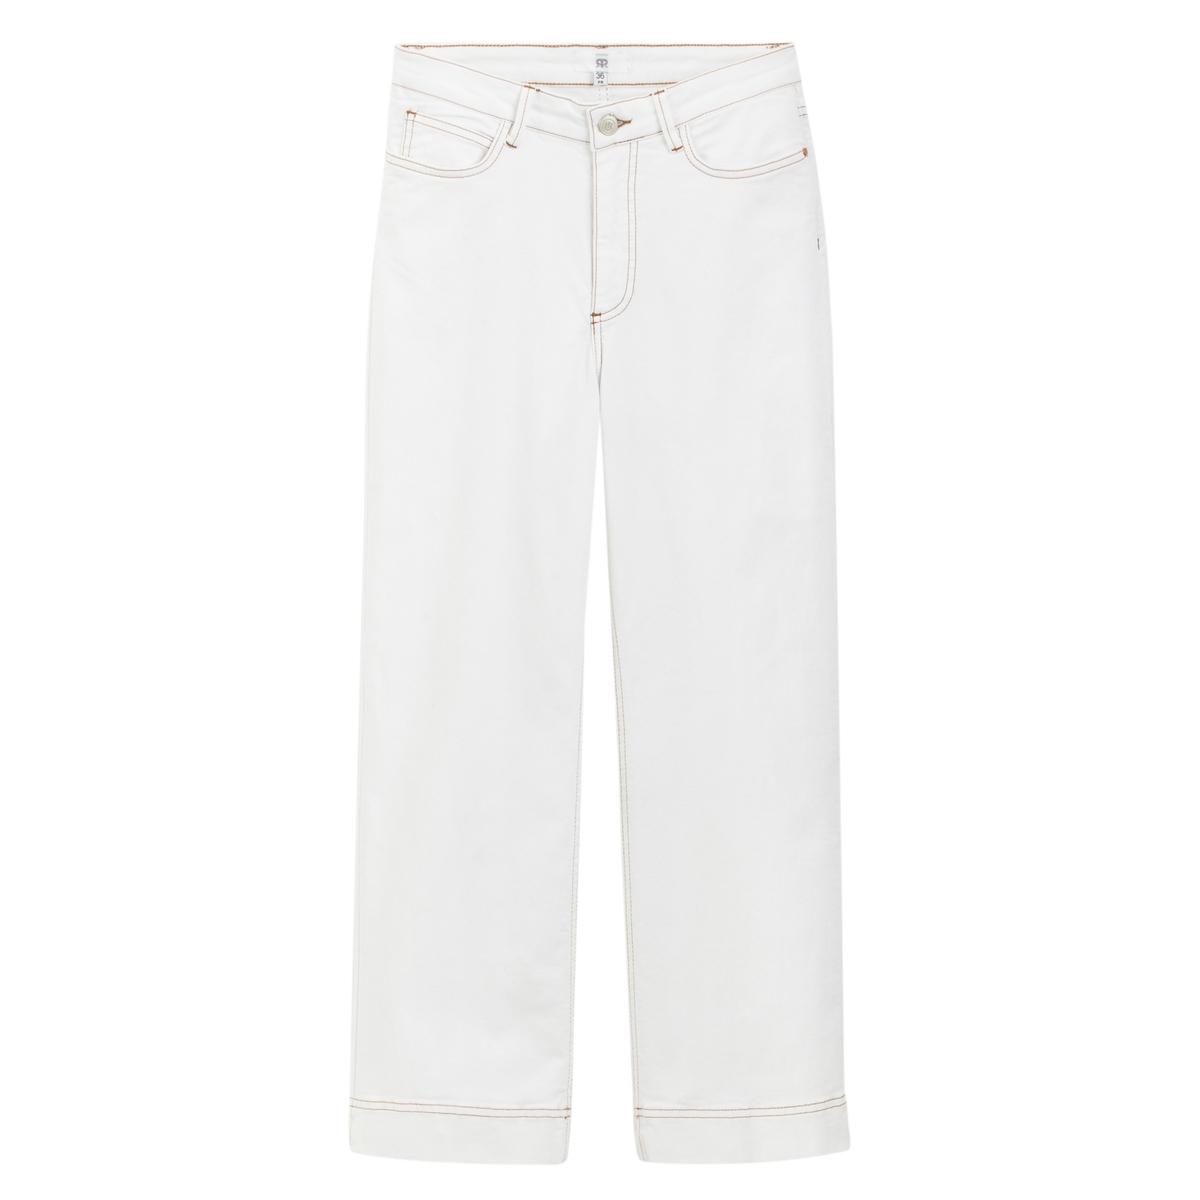 Jeans curtos, largos